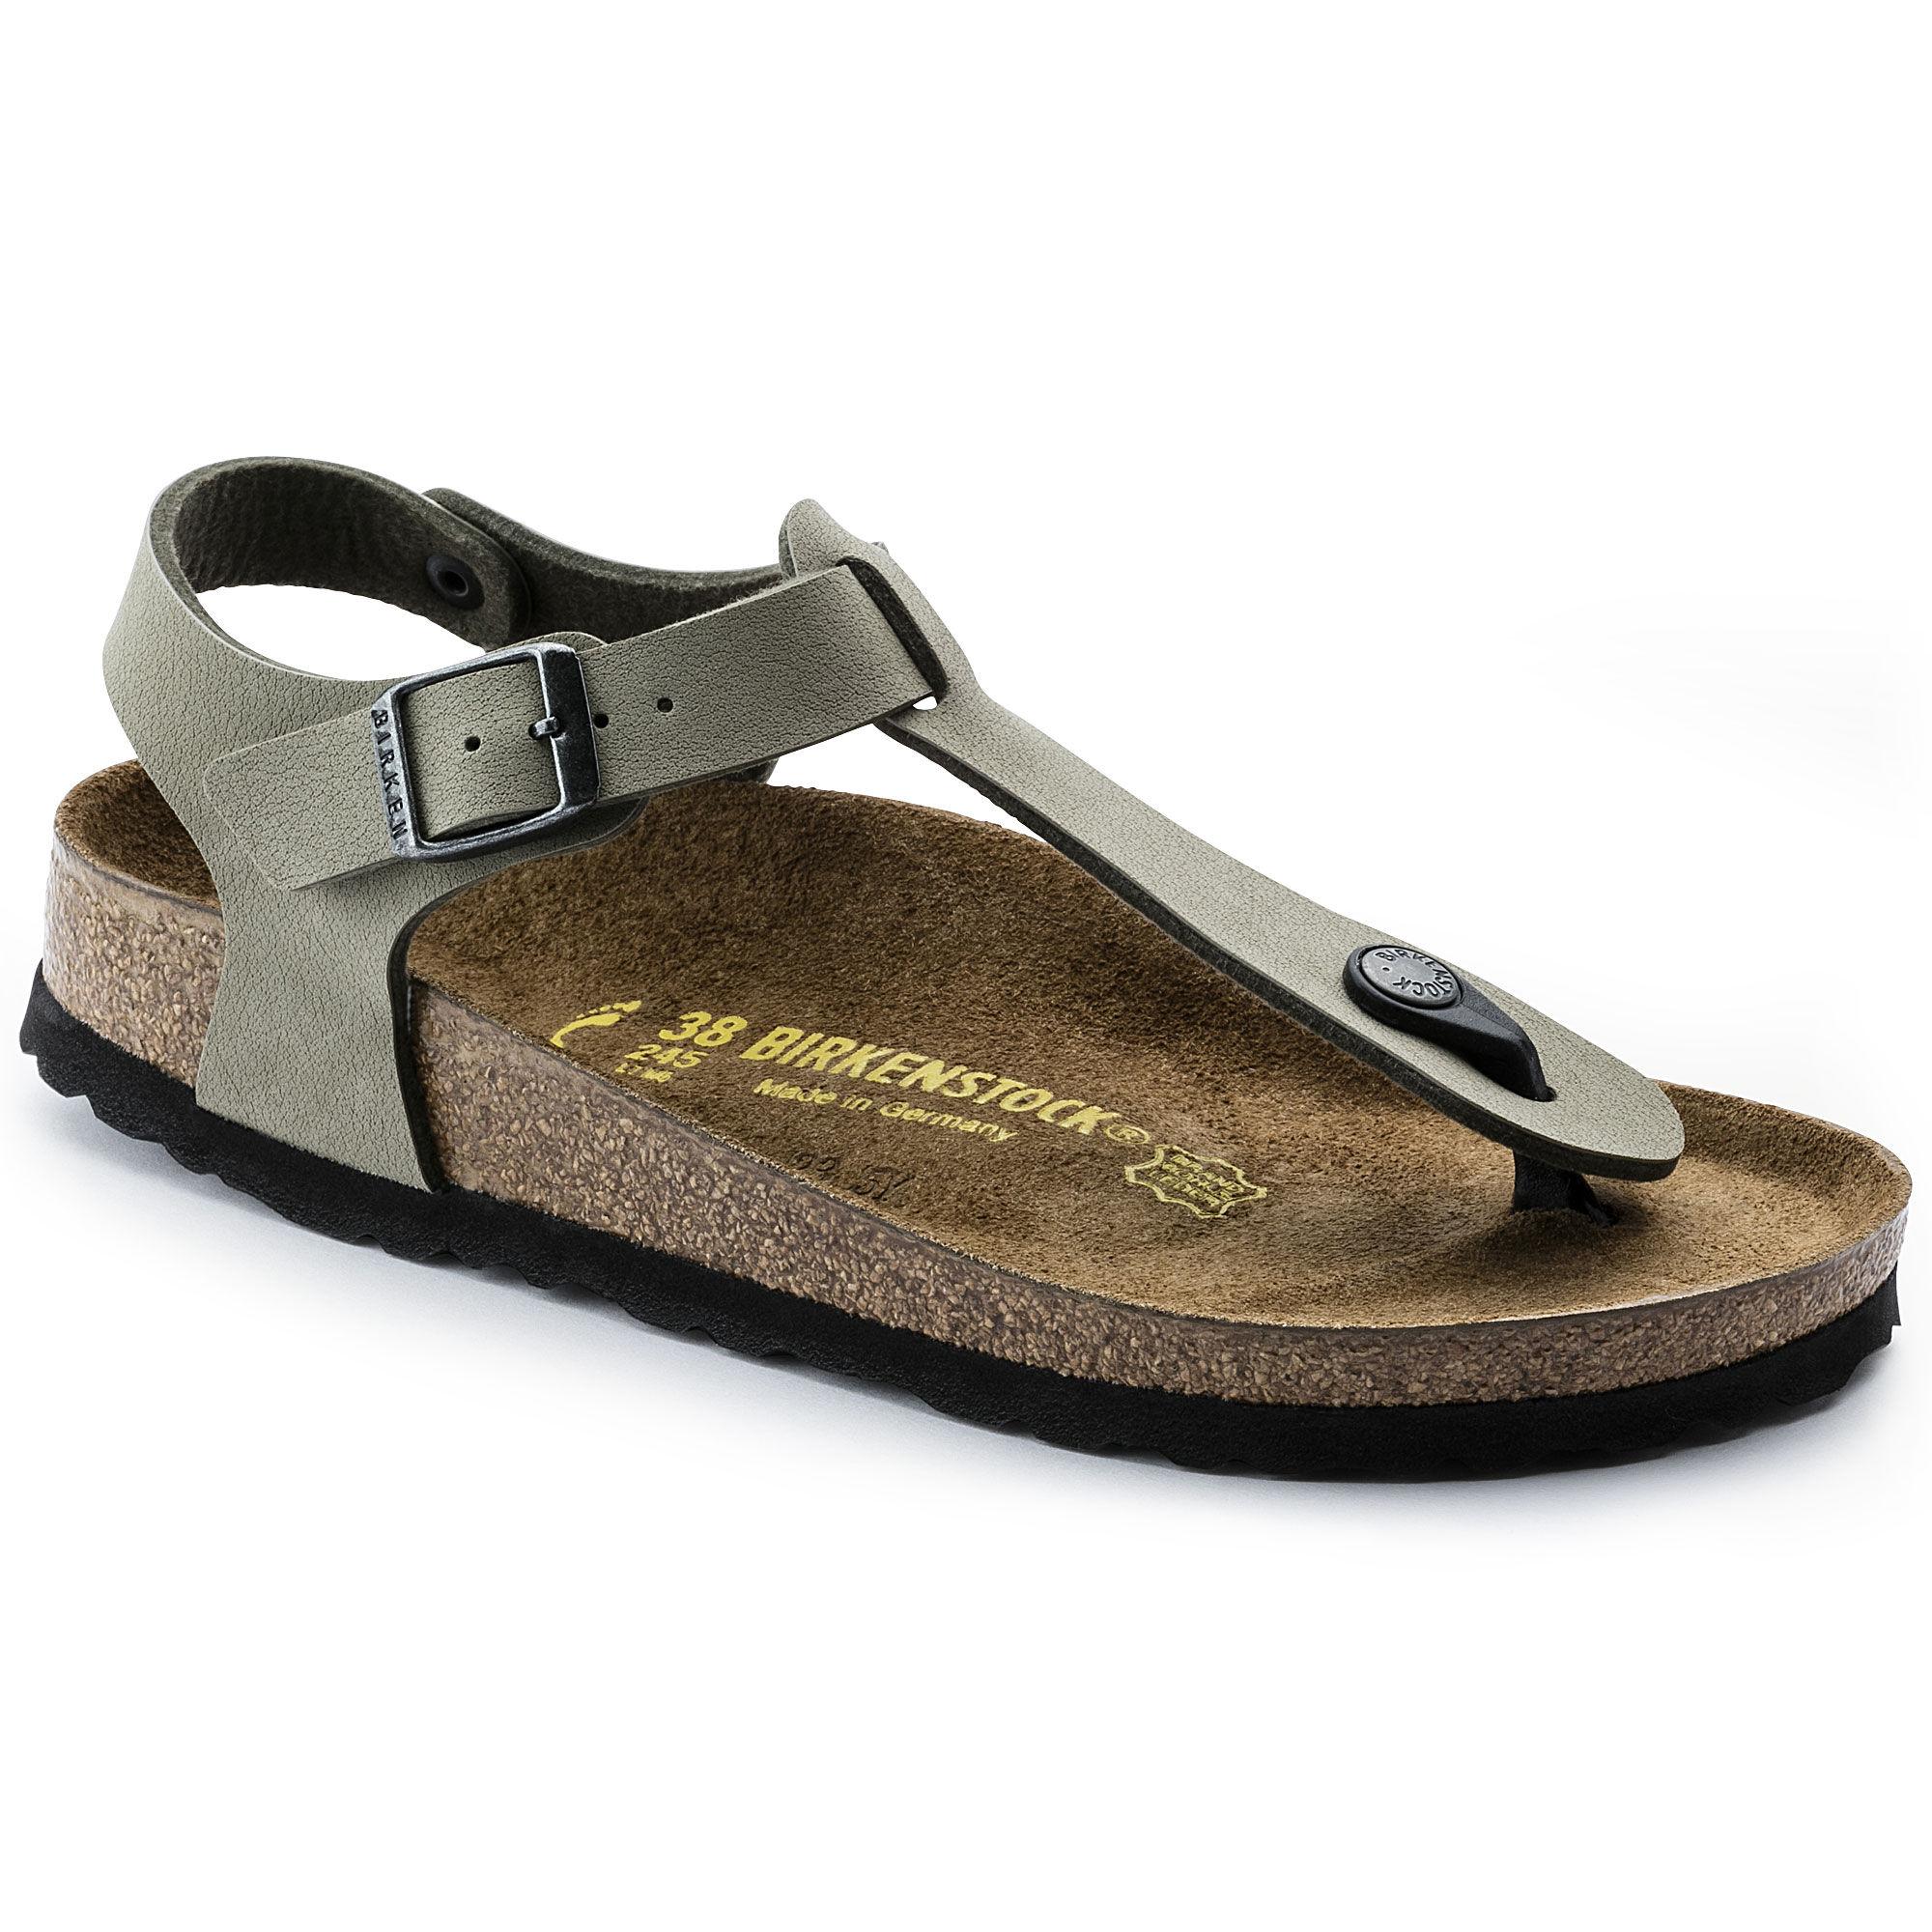 birkenstock kairo khaki kairo kairo sandalo birkenstock sandalo birkenstock khaki rrgqxOdw